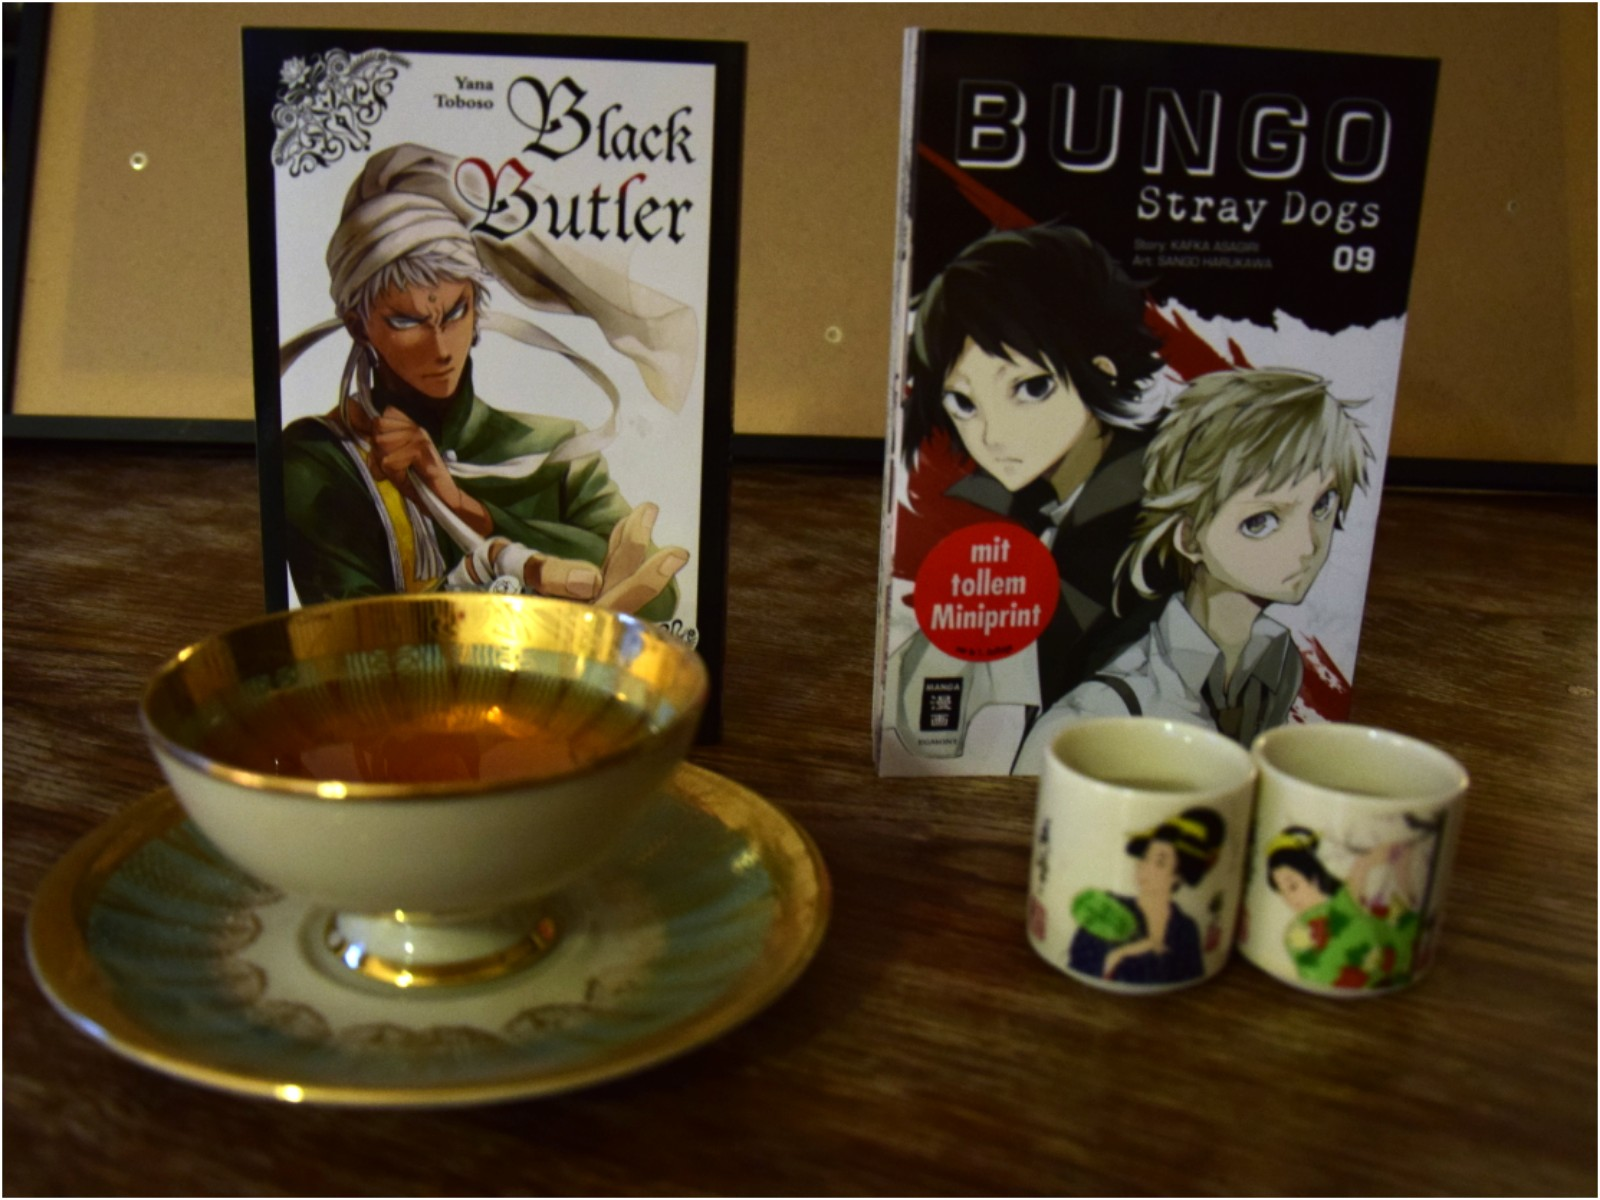 Black Butler und Bungou stray dogs Manga